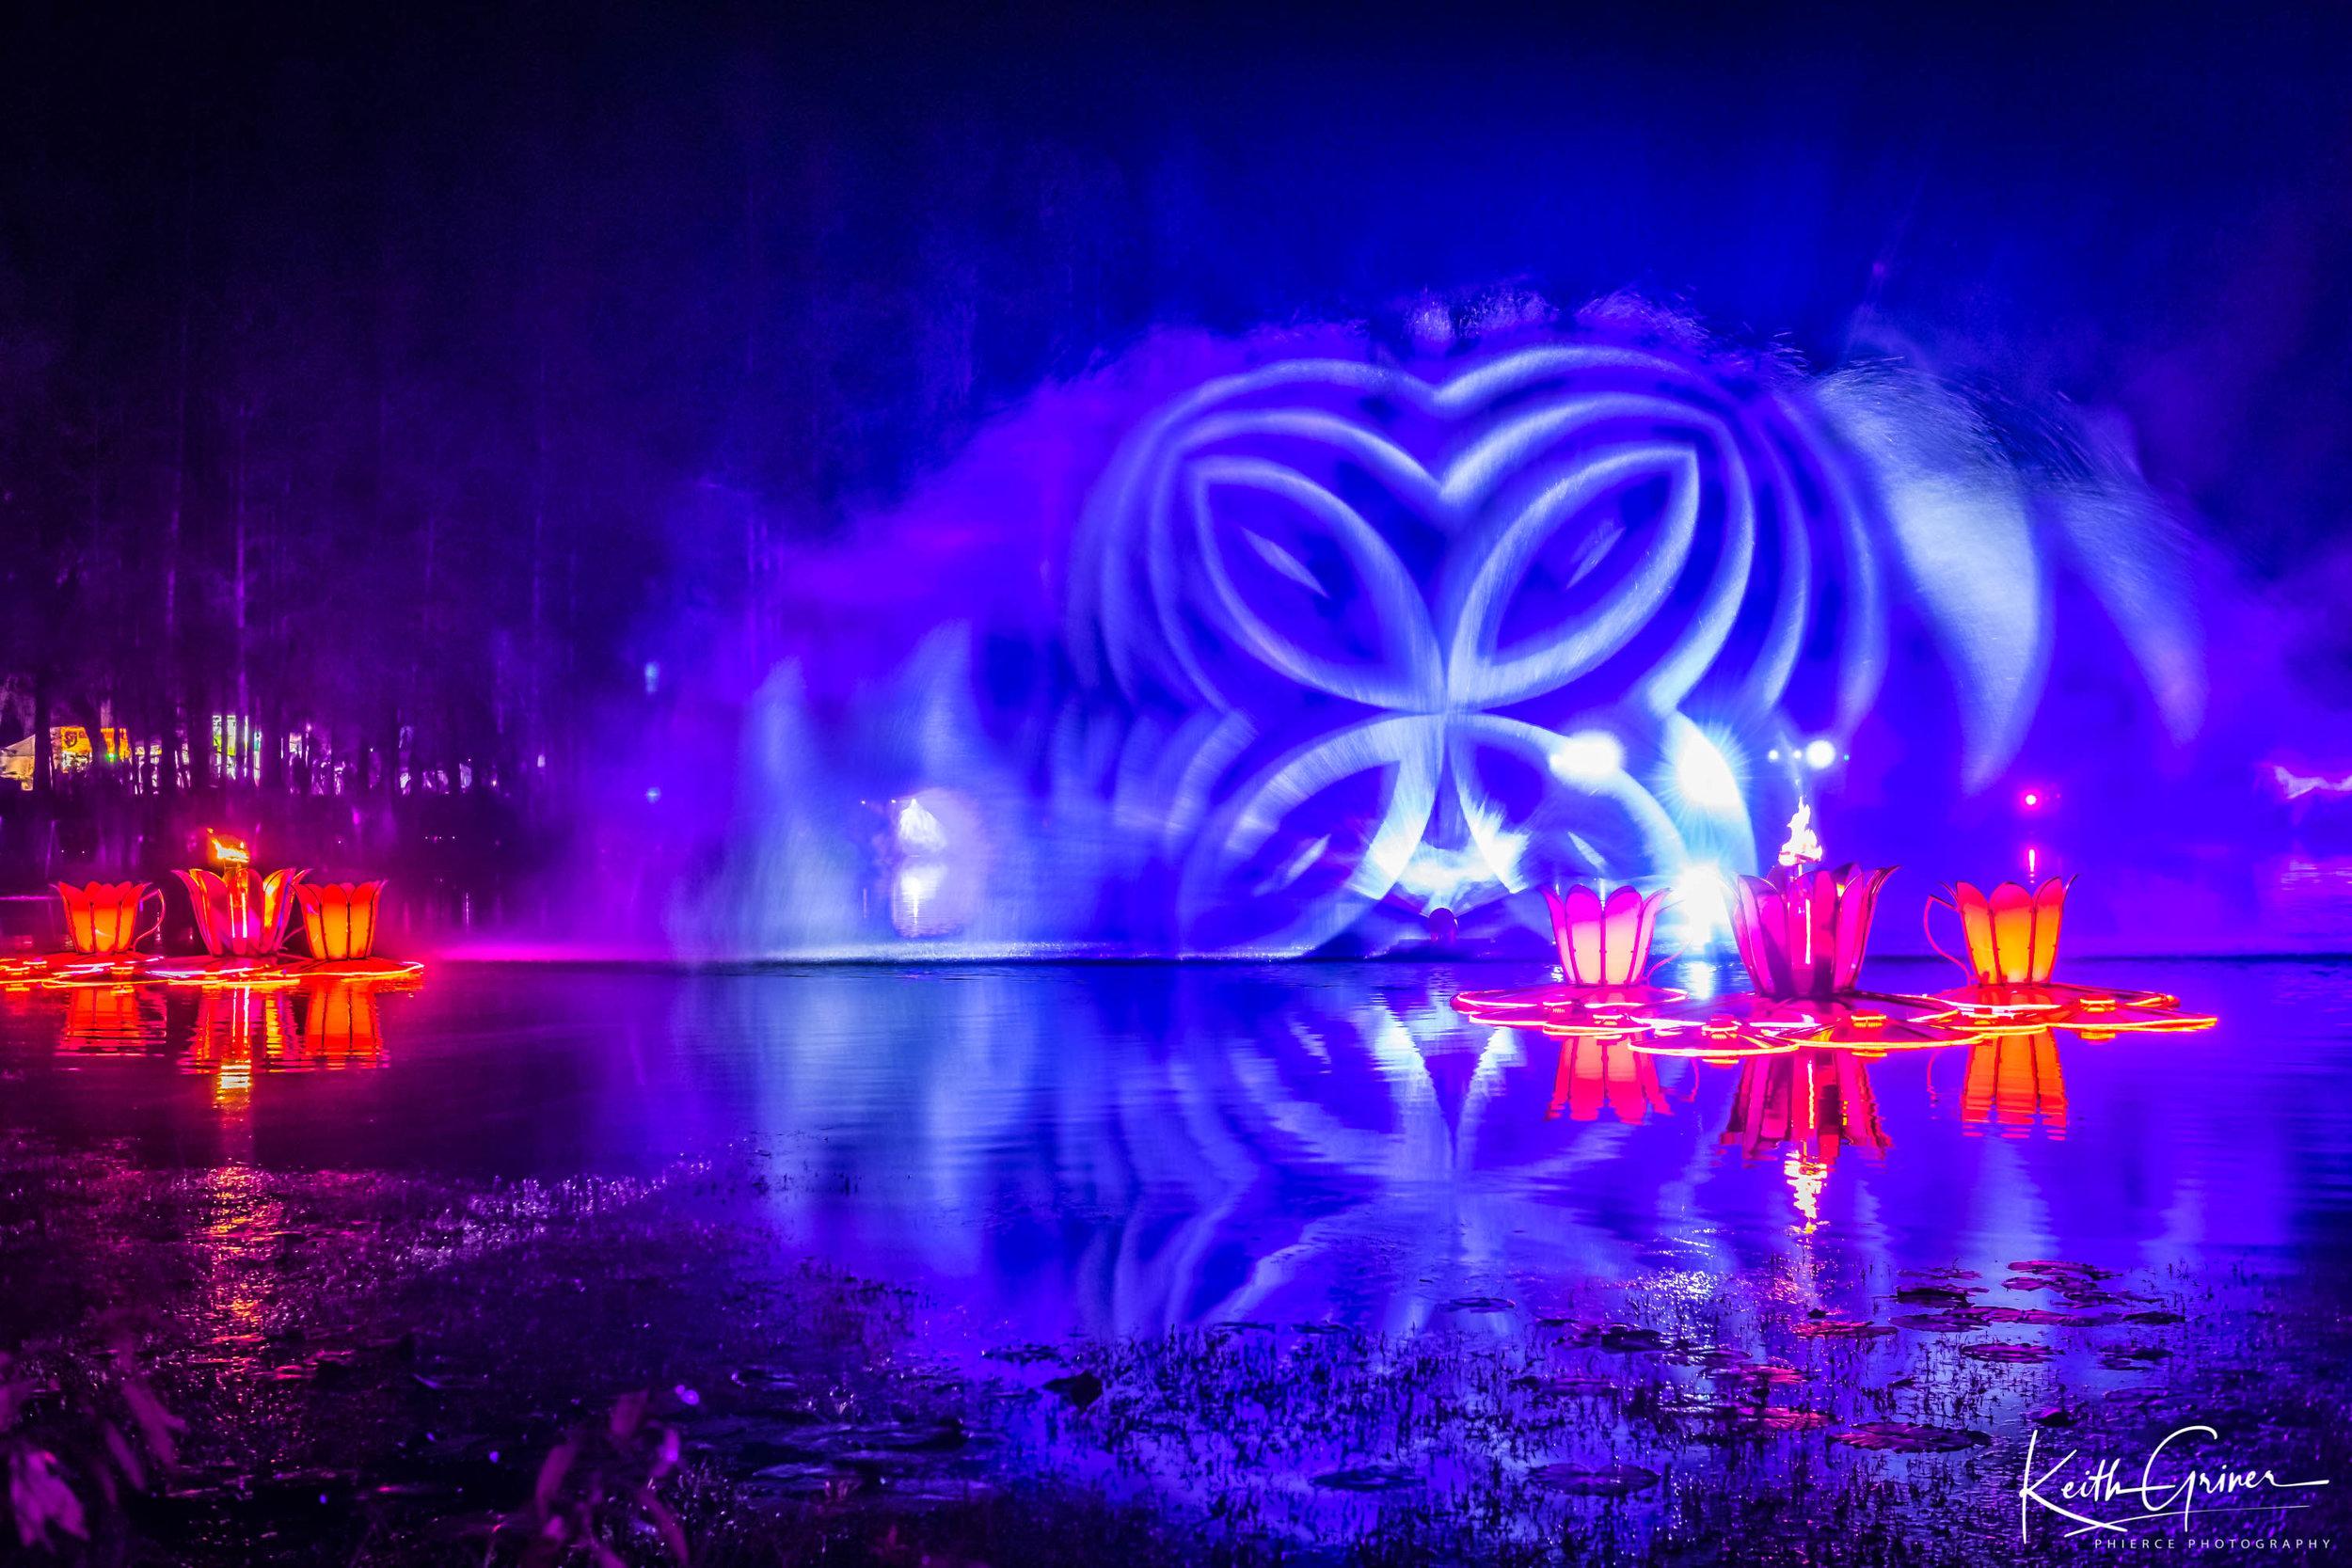 Hula_Spirit Lake_by Keith Griner 0D5_3235-Edit.jpg